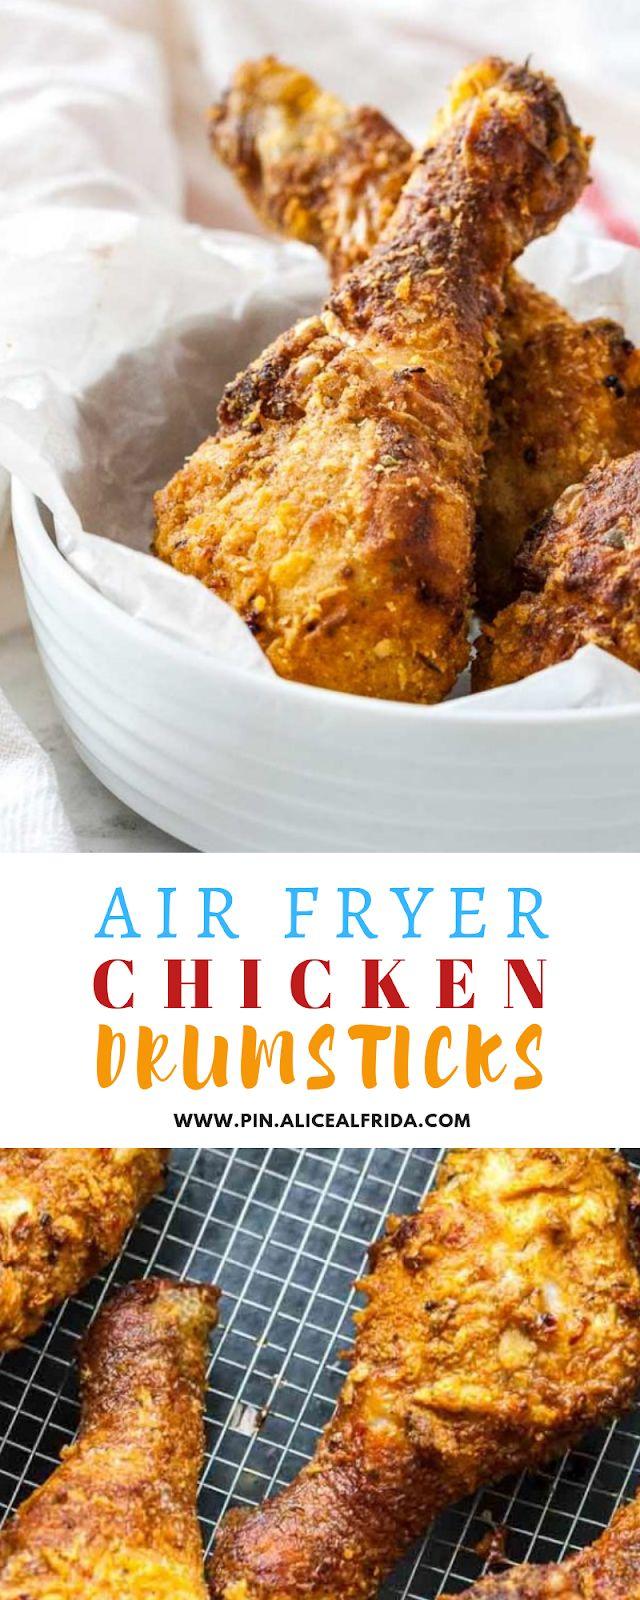 Air Fryer Chicken Drumsticks Air fryer recipes